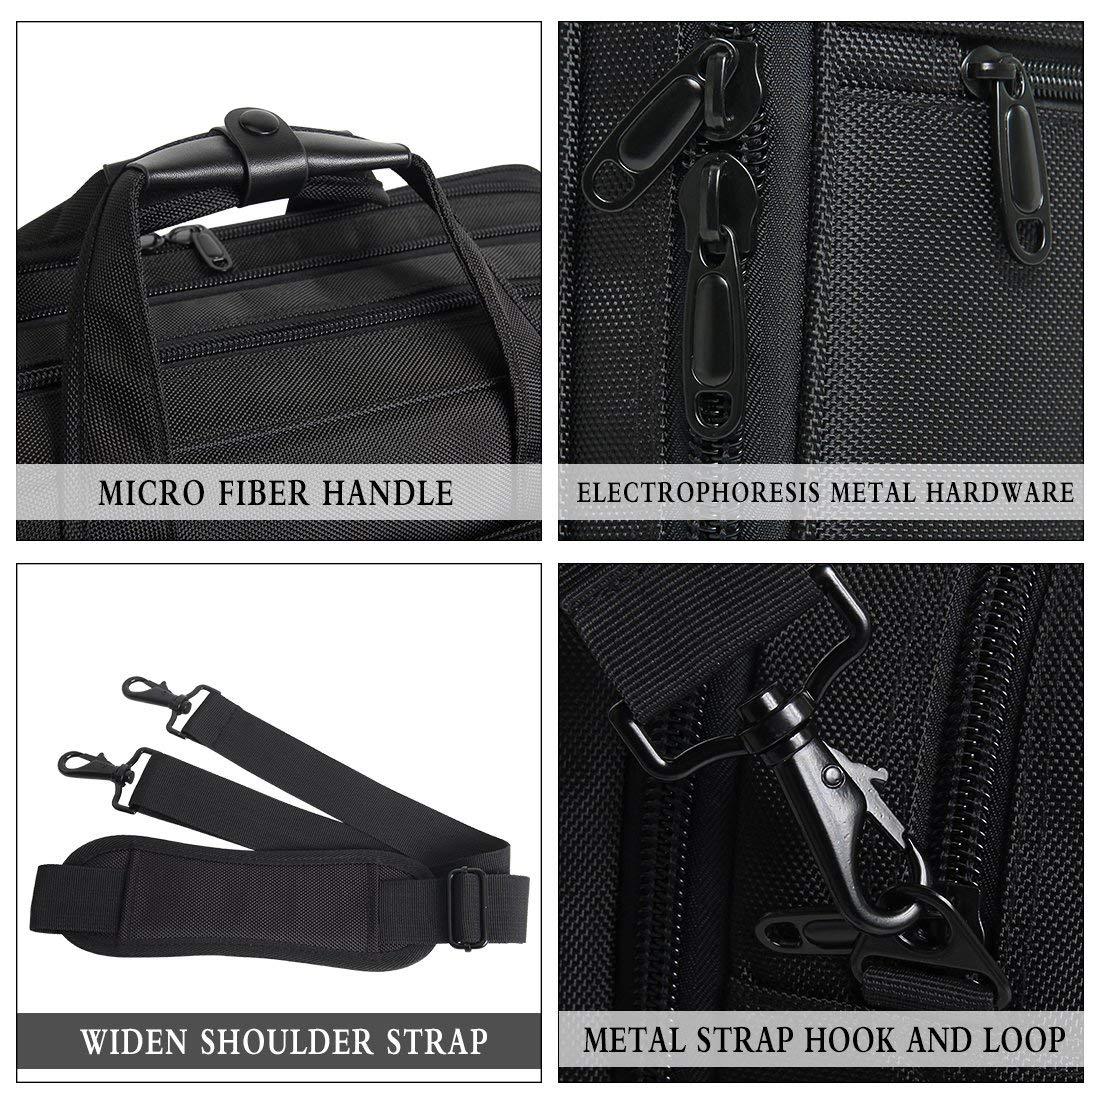 18-18.5 inch Laptop Bag,Water Resisatant Business Laptop Briefcase,Expandable High Capacity Shoulder Bag,Nylon Multi-Functional Shoulder Messenger Bag for Men Fits 17.3 inch Loptop,Computer,Tablet by LYALPH (Image #7)